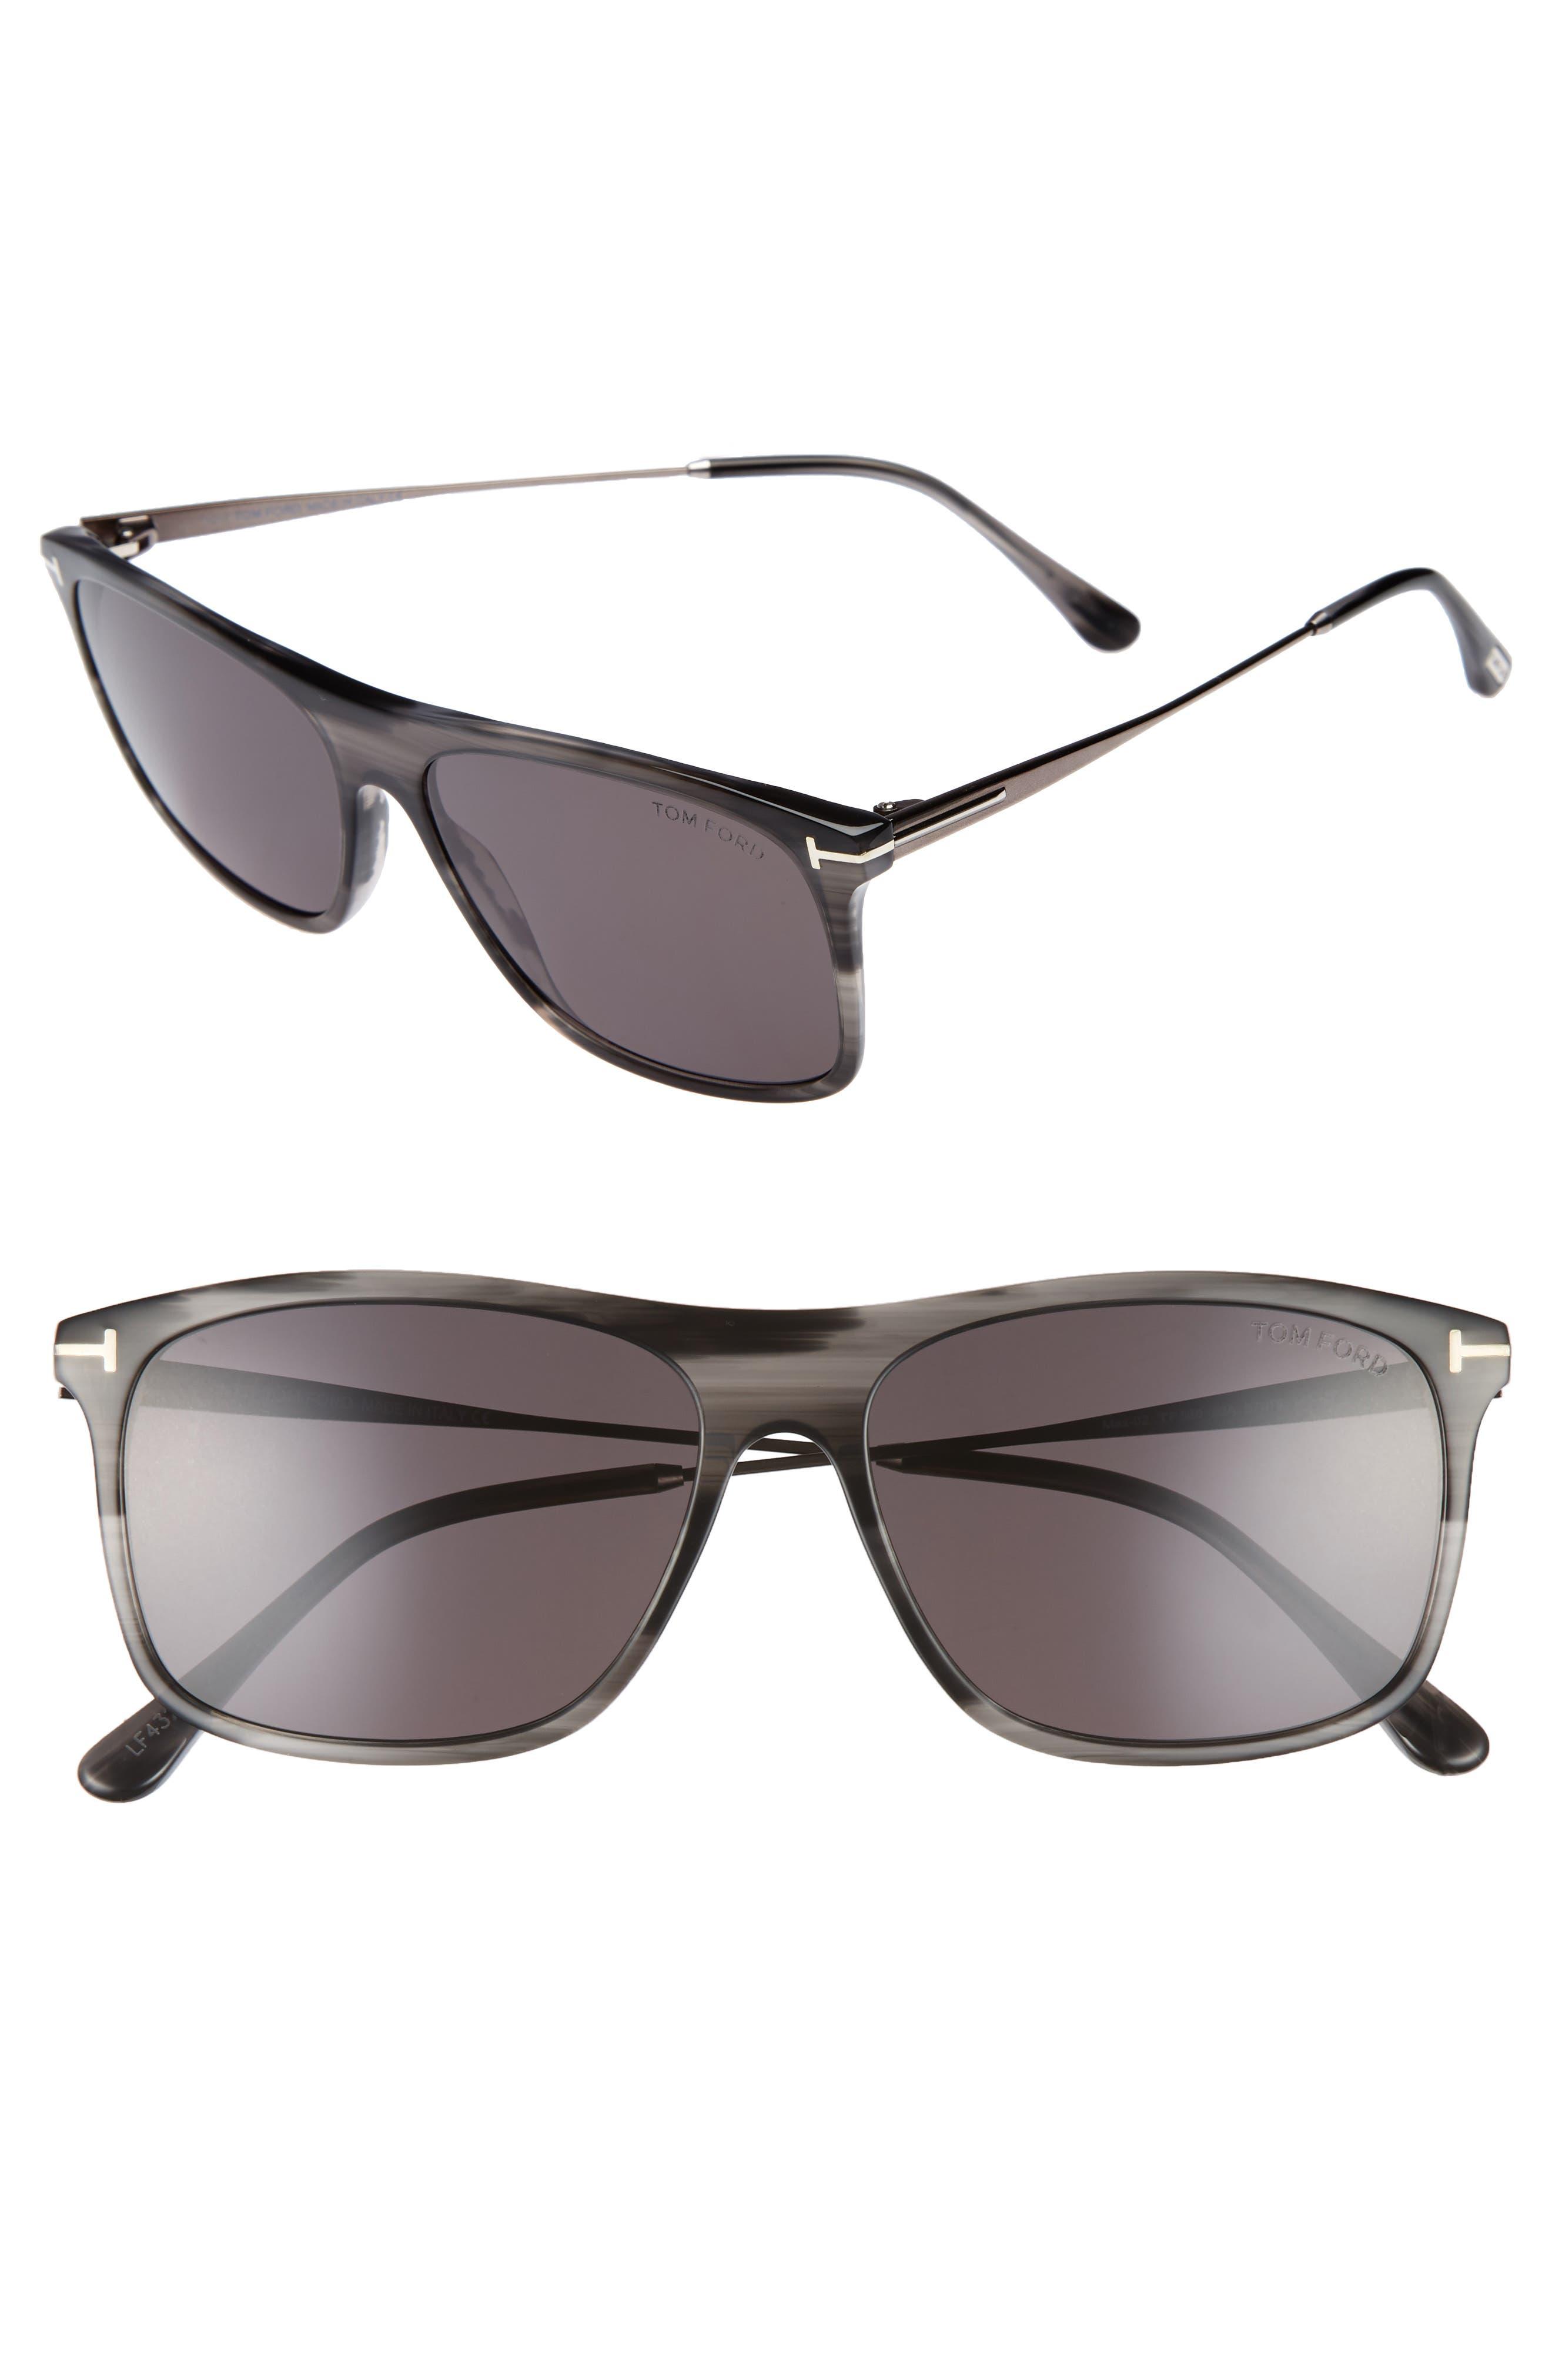 Max 57mm Sunglasses,                             Main thumbnail 1, color,                             Grey/ Black/ Ruthenium/ Smoke